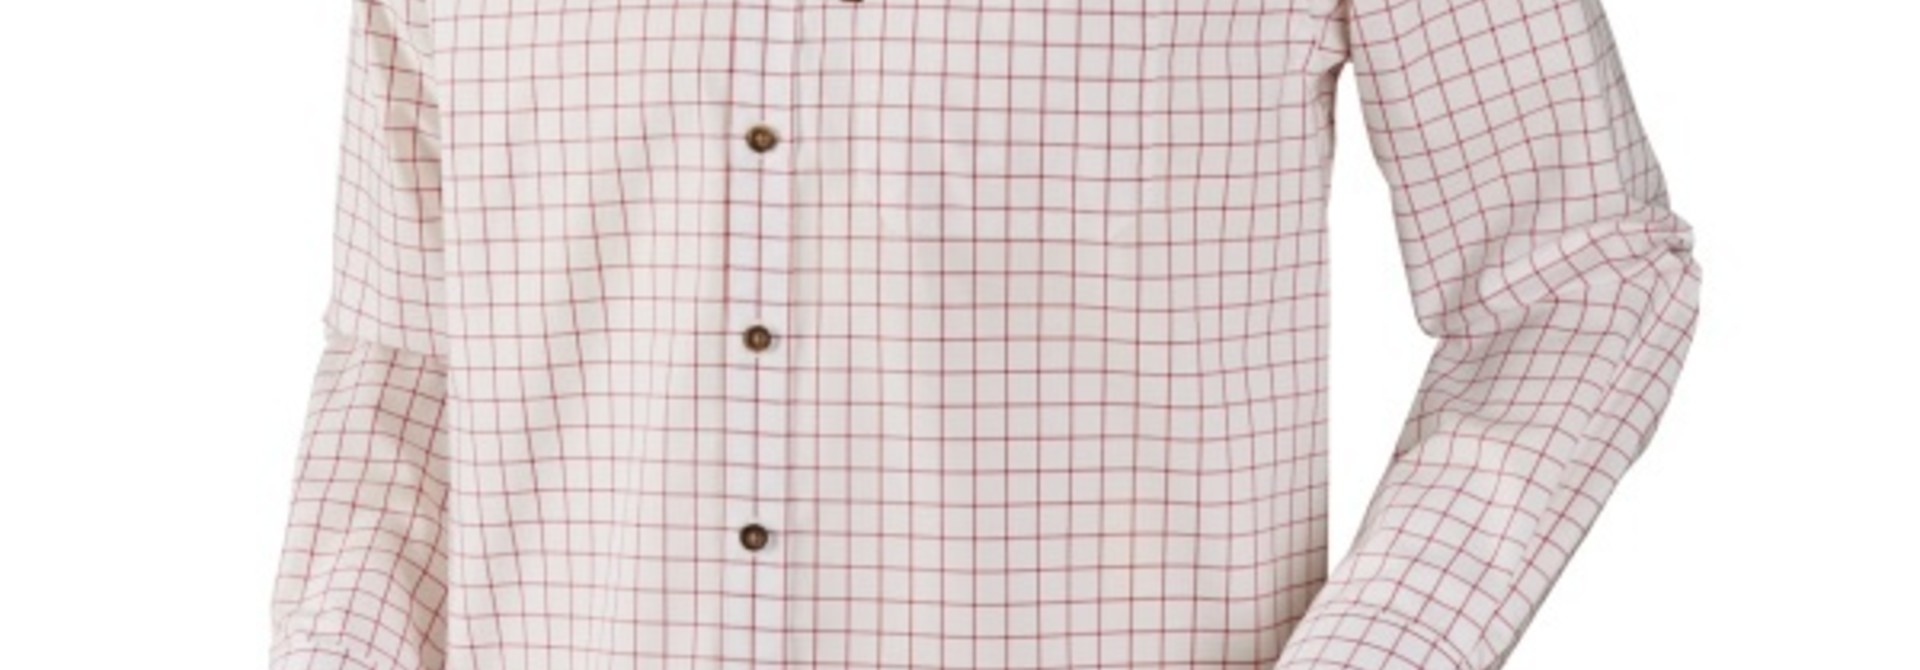 Härkila Stenstorp Shirt Bright Port Check Button-Under